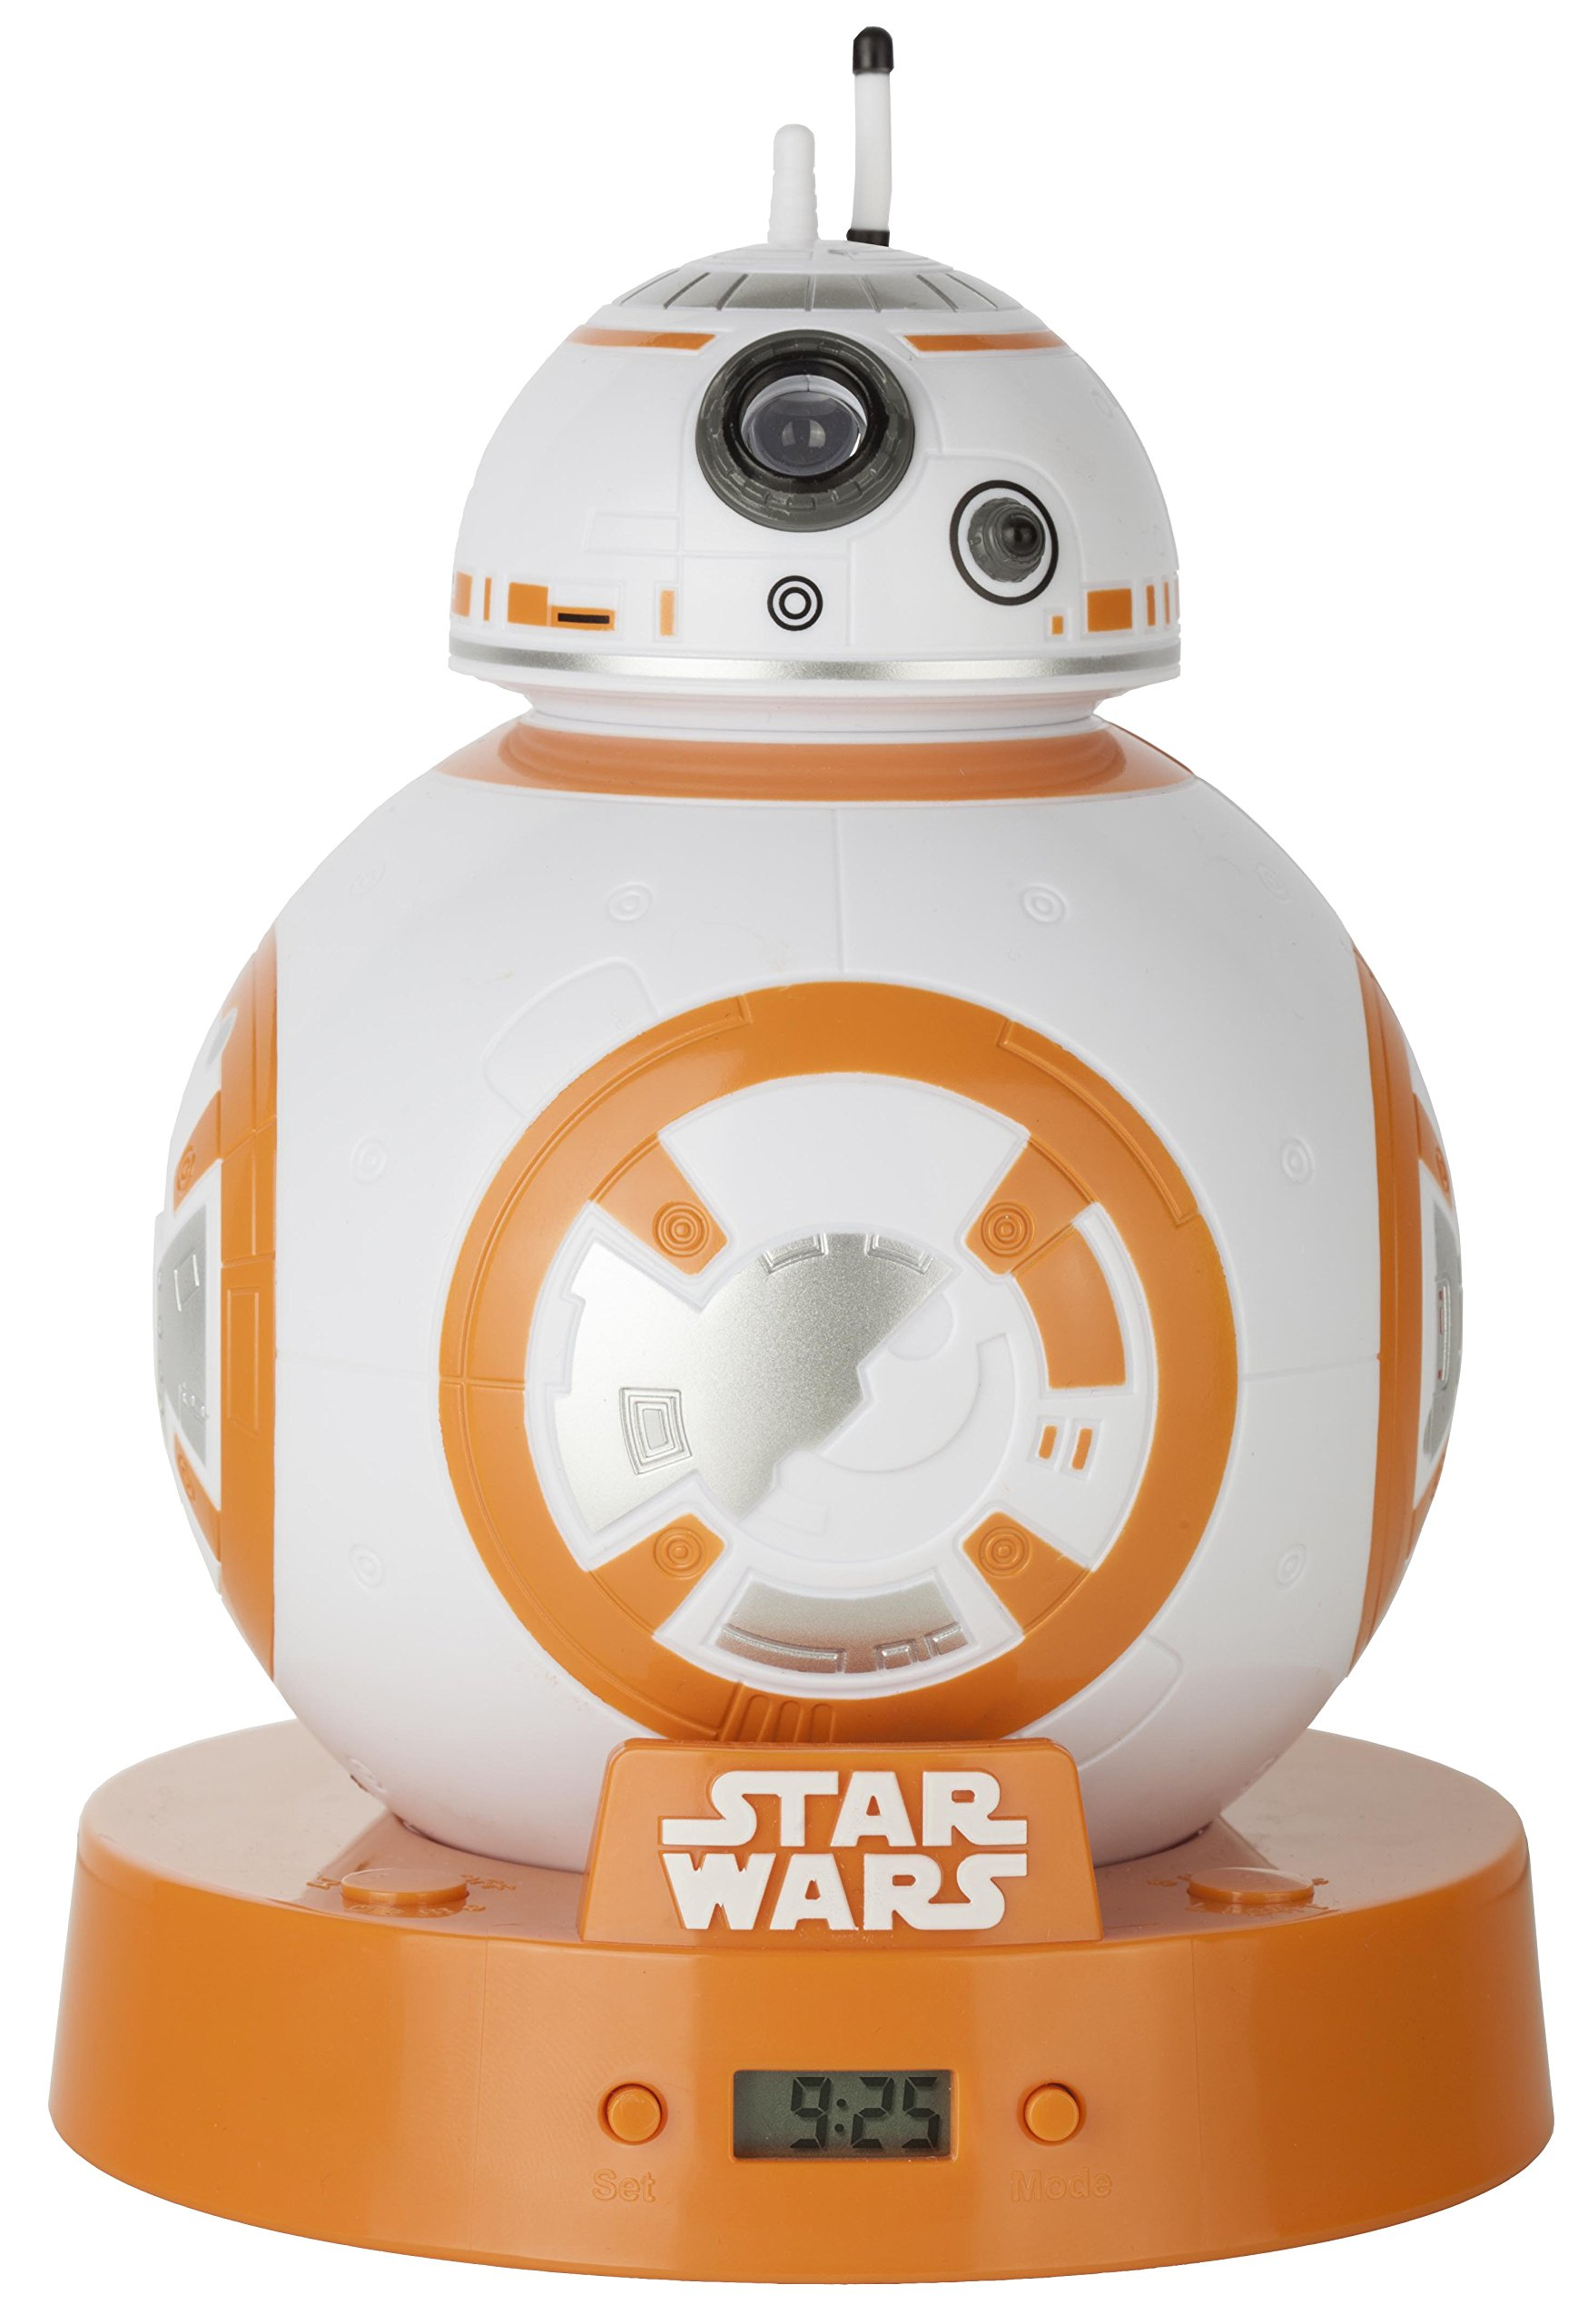 Star Wars BB8 Projection Alarm Clock, White/Orange, 12.5 x 12.5 x 17.5 cm by Star Wars